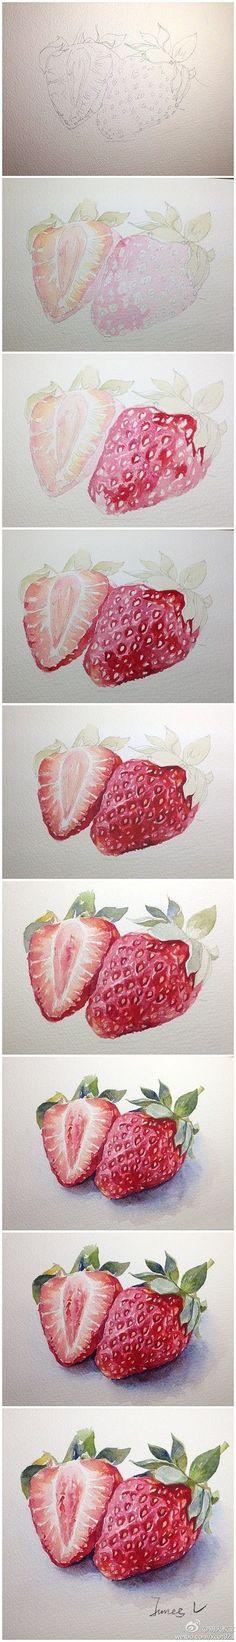 Strawberry watercolor art! My favorite fruit drawn with my favorite medium: